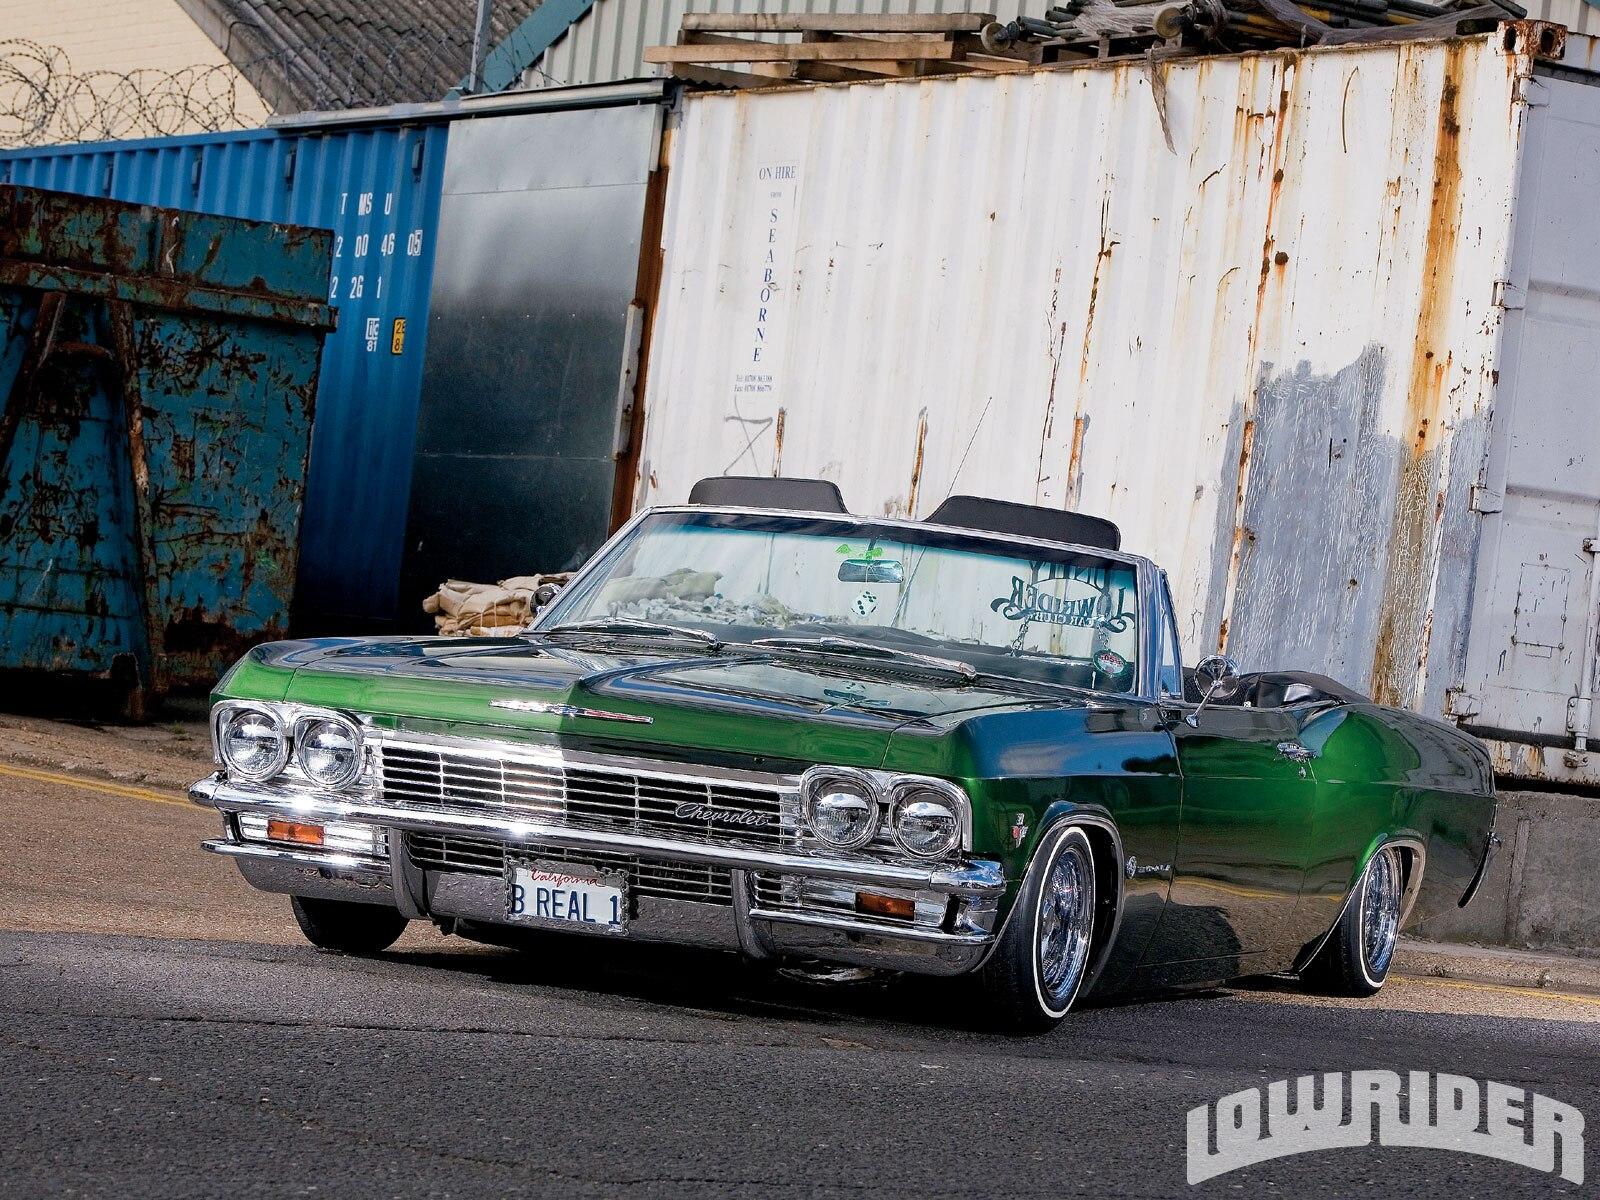 1104 Lrmp 1965 Chevrolet Impala